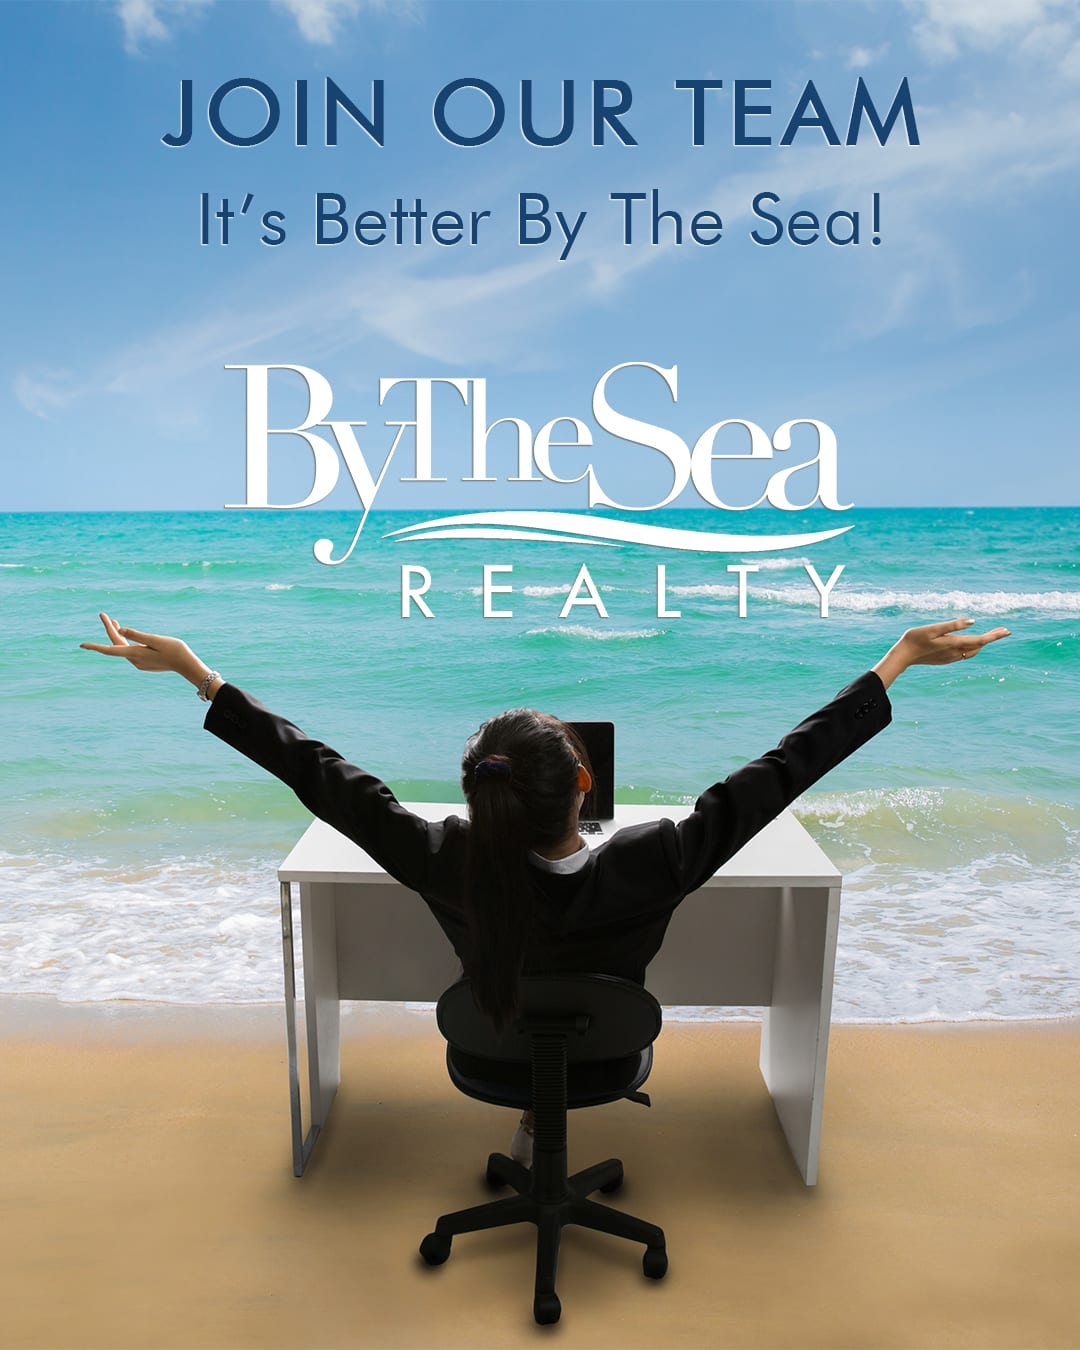 Fort Lauderdale Real Estate Jobs